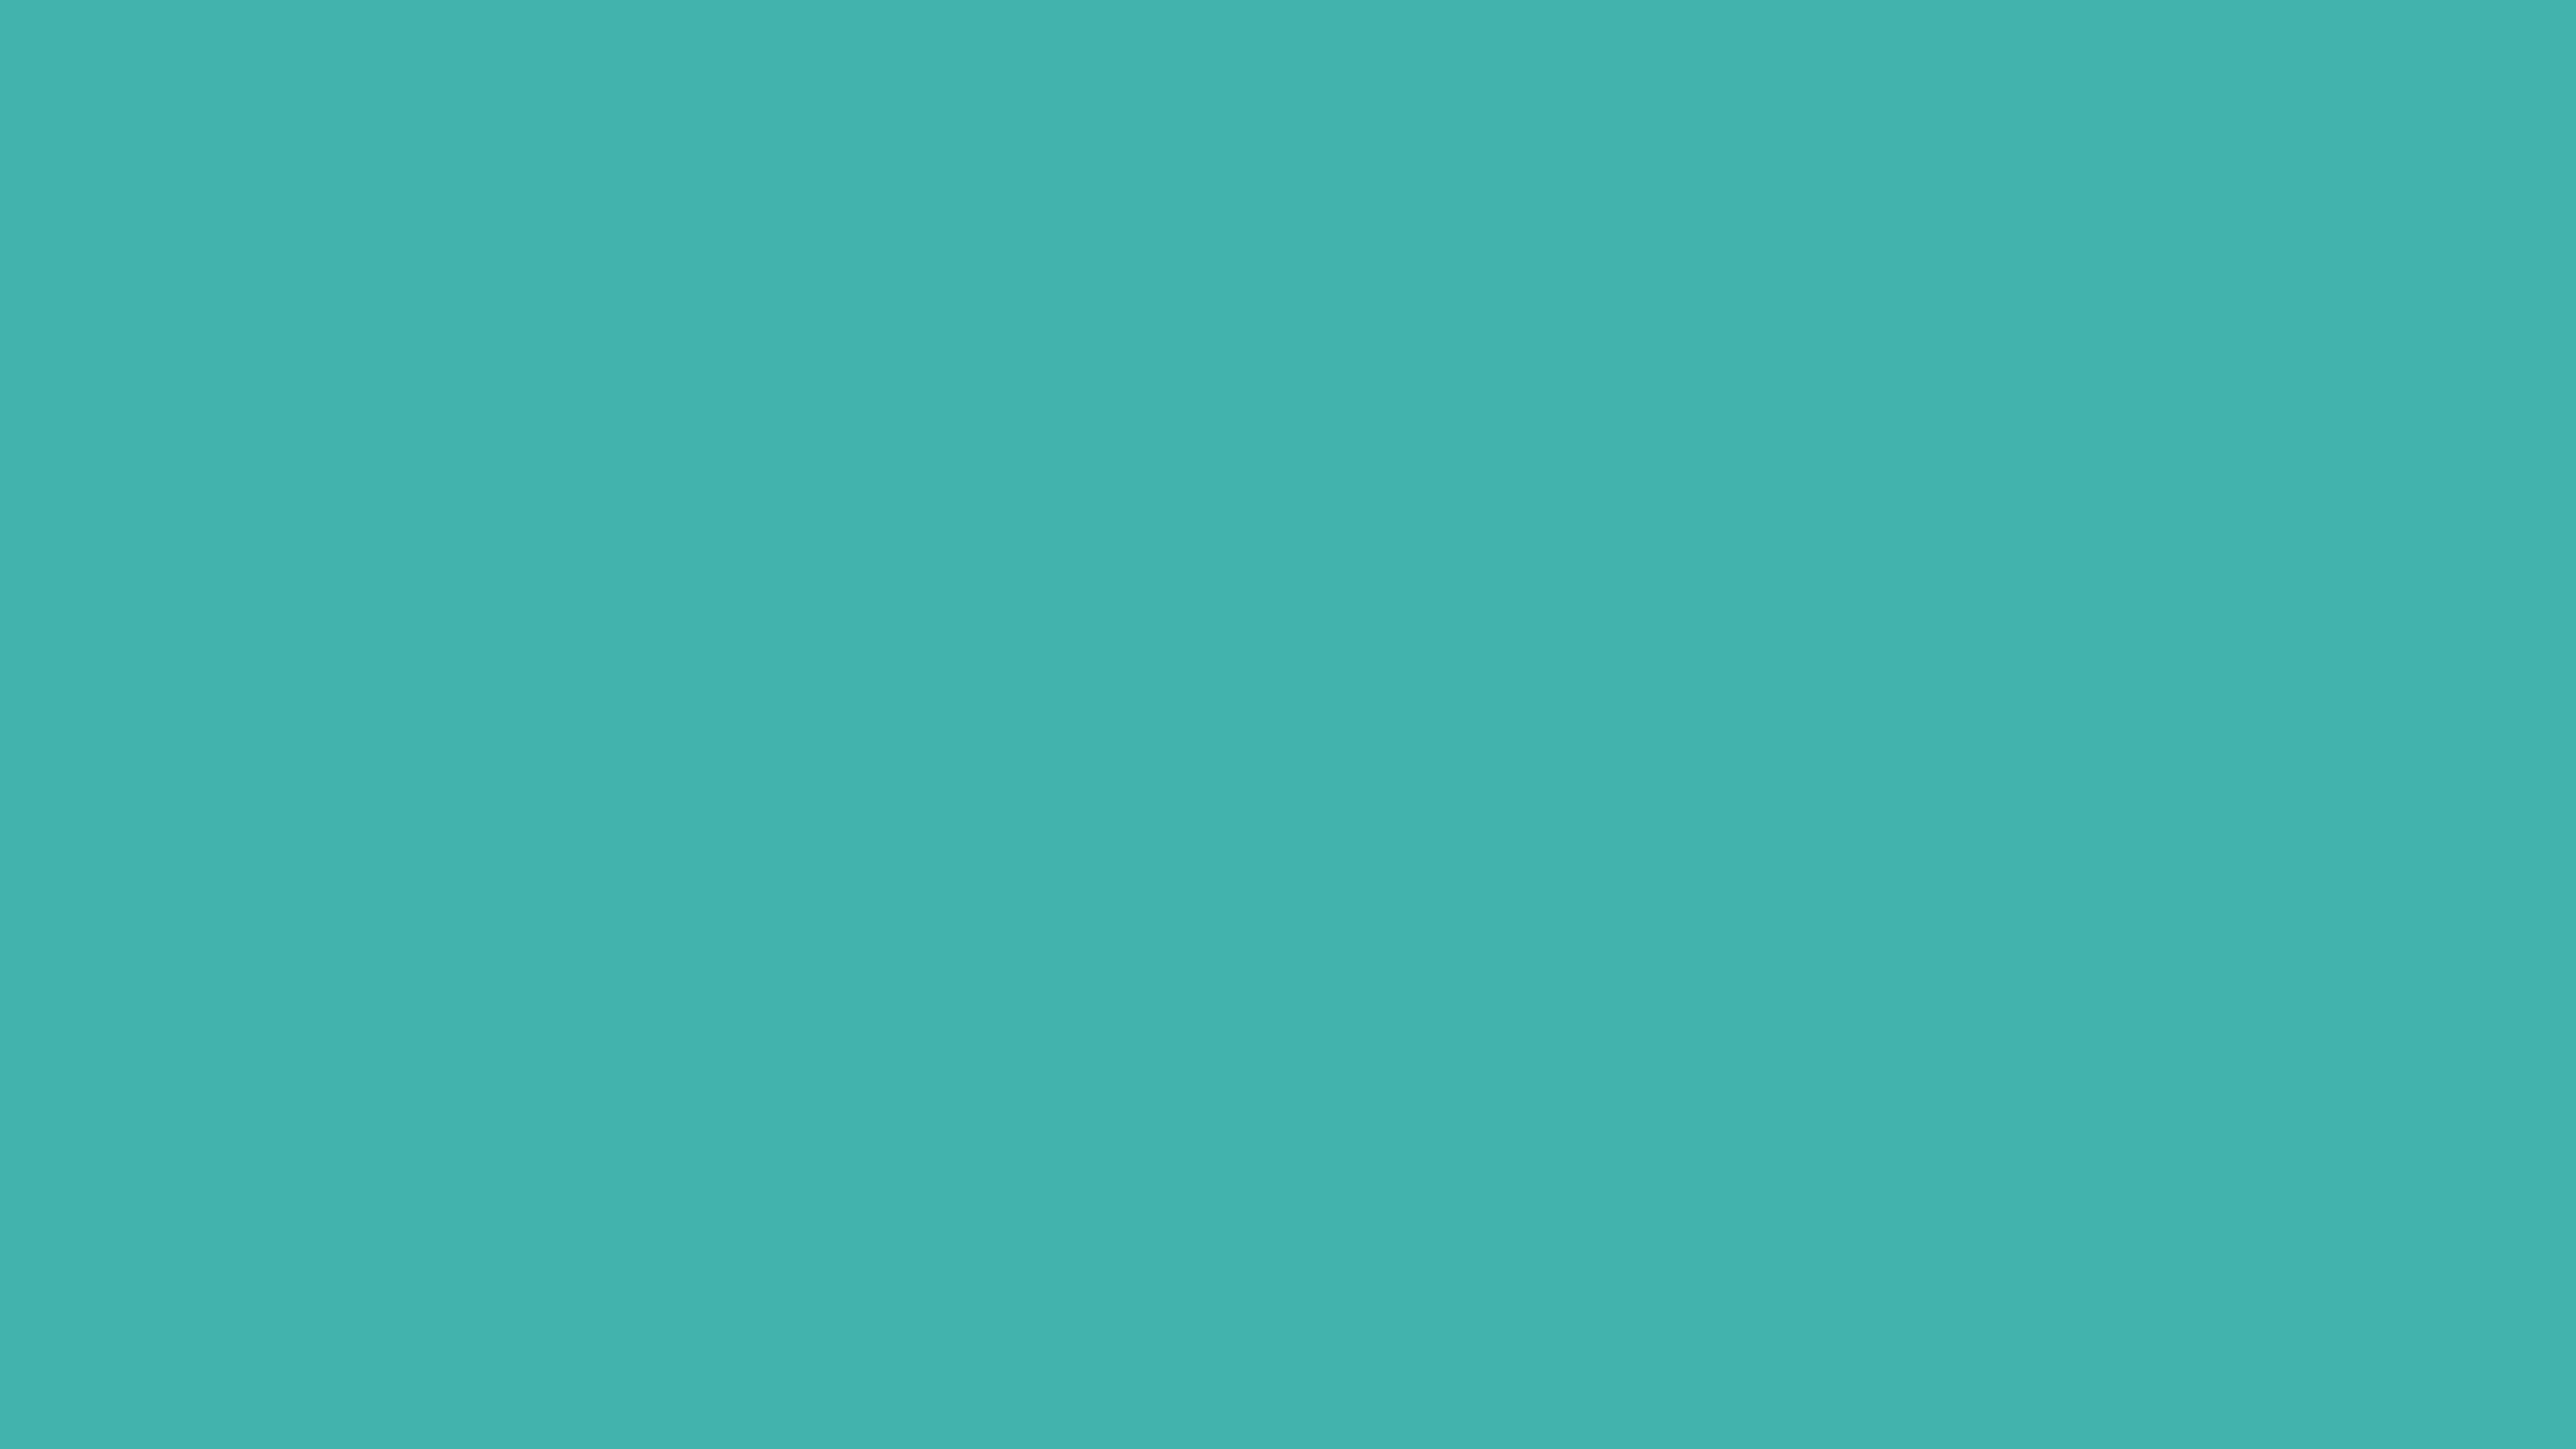 7680x4320 Verdigris Solid Color Background